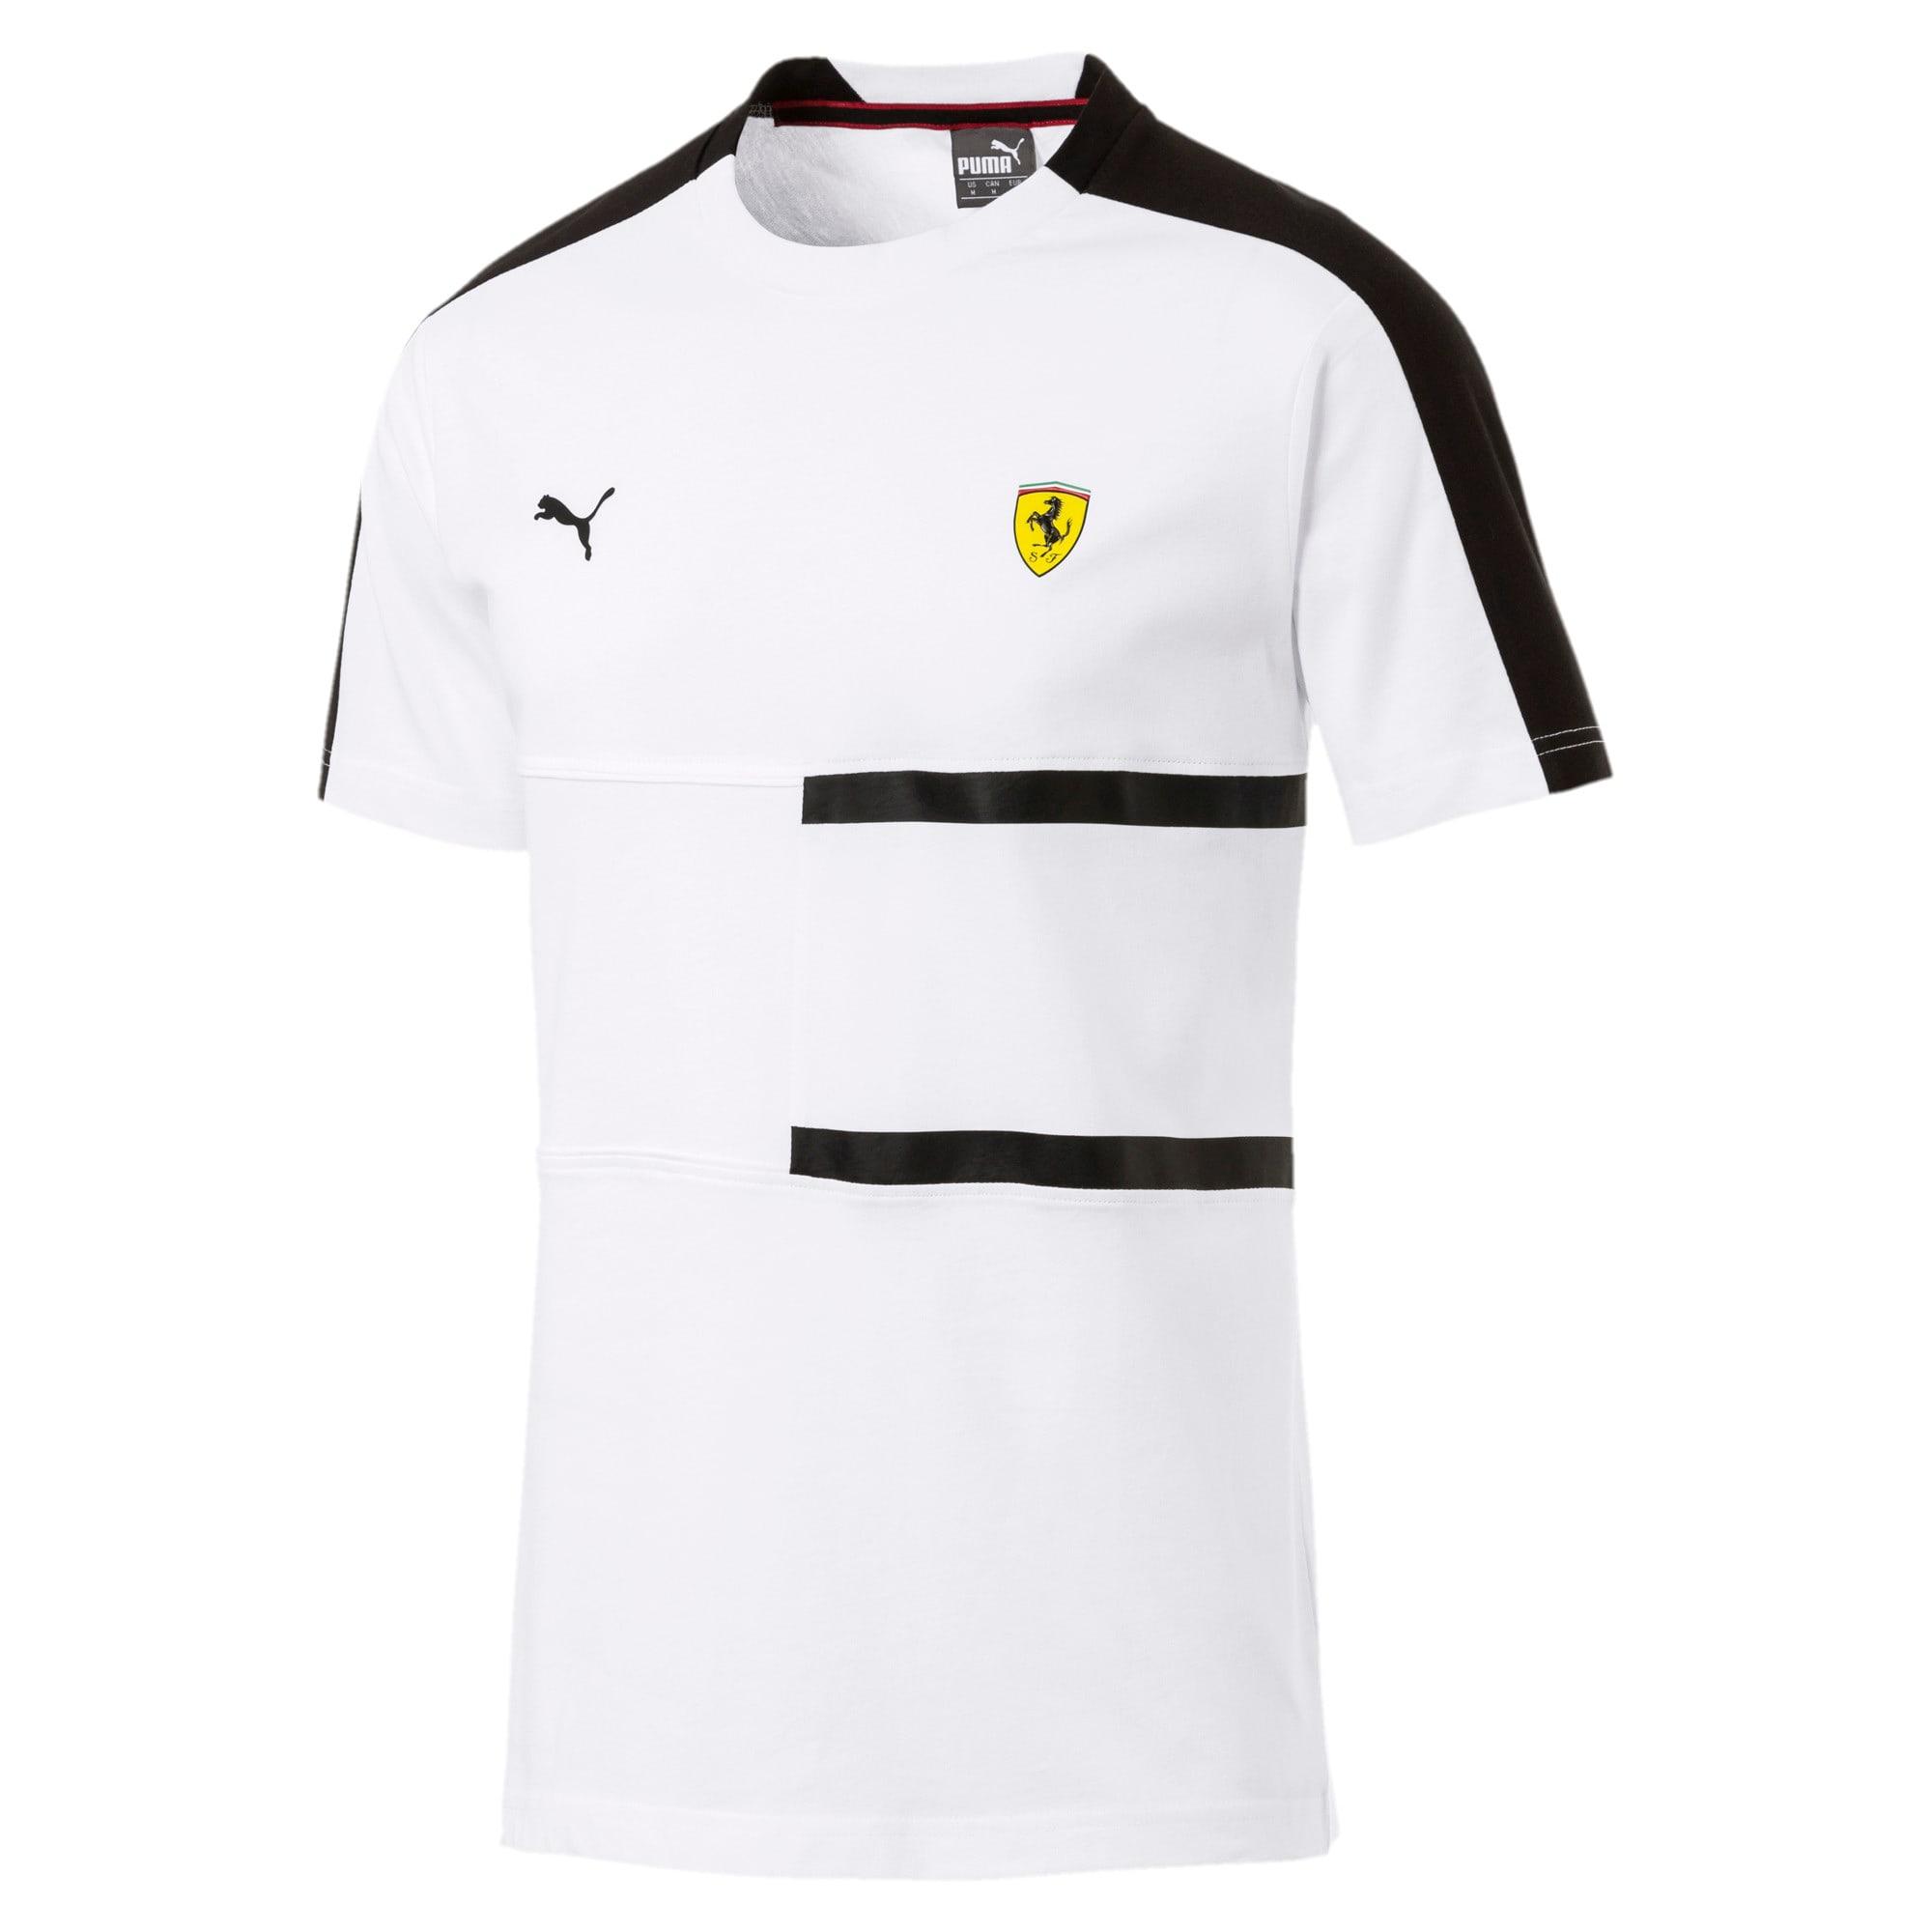 Thumbnail 1 of フェラーリ T7 Tシャツ, Puma White, medium-JPN